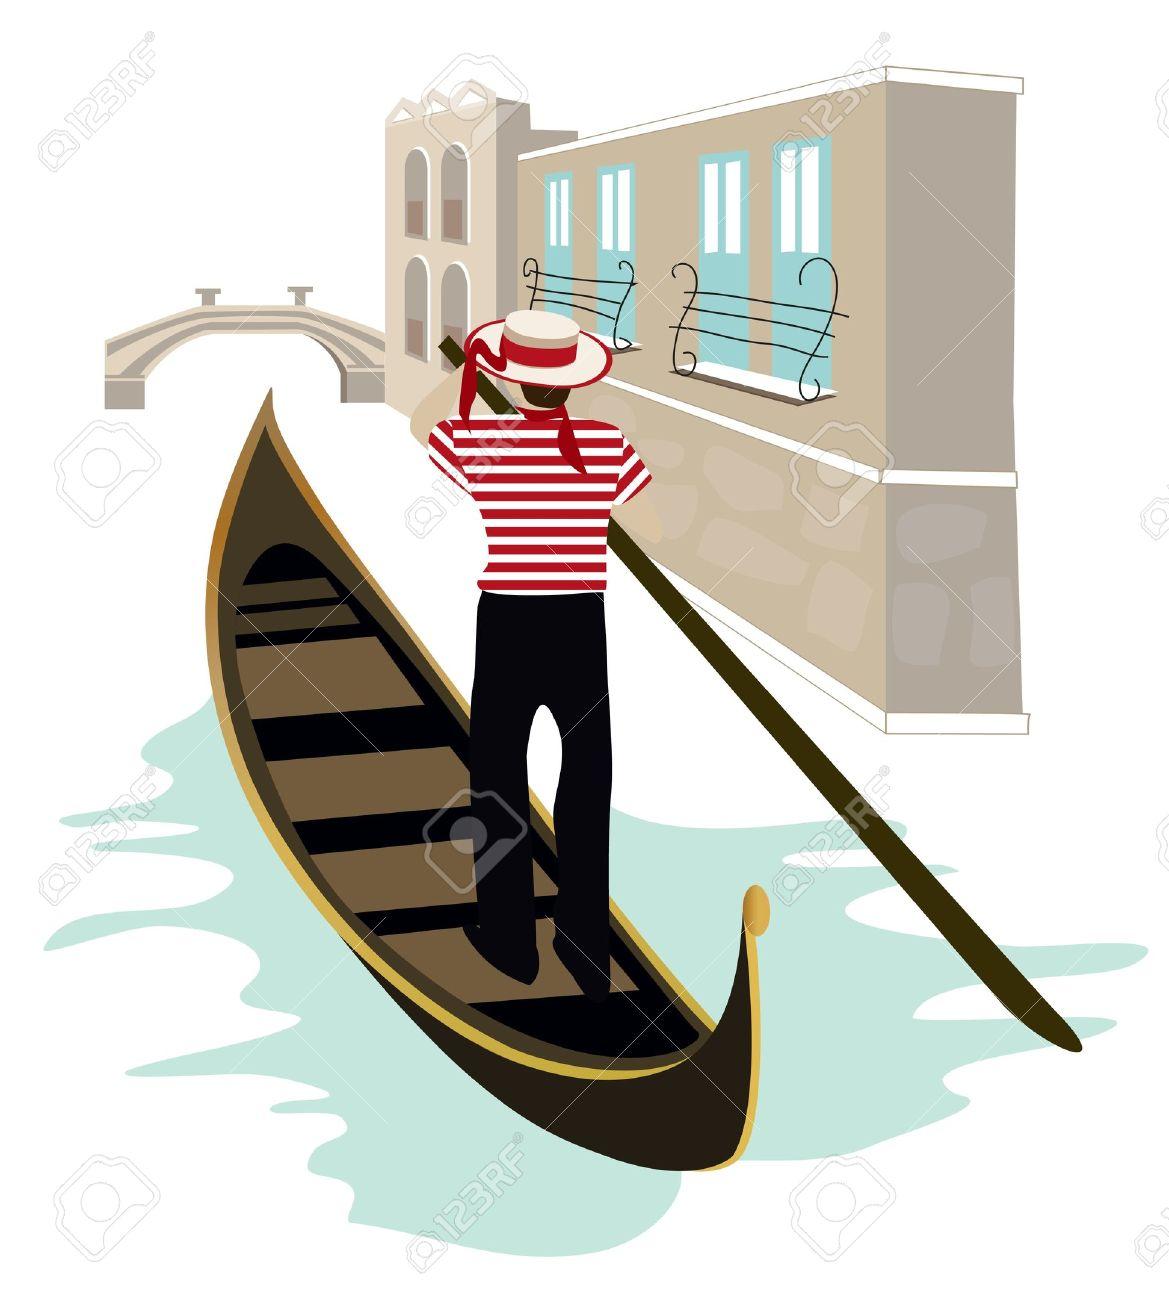 Venice gondola clipart.